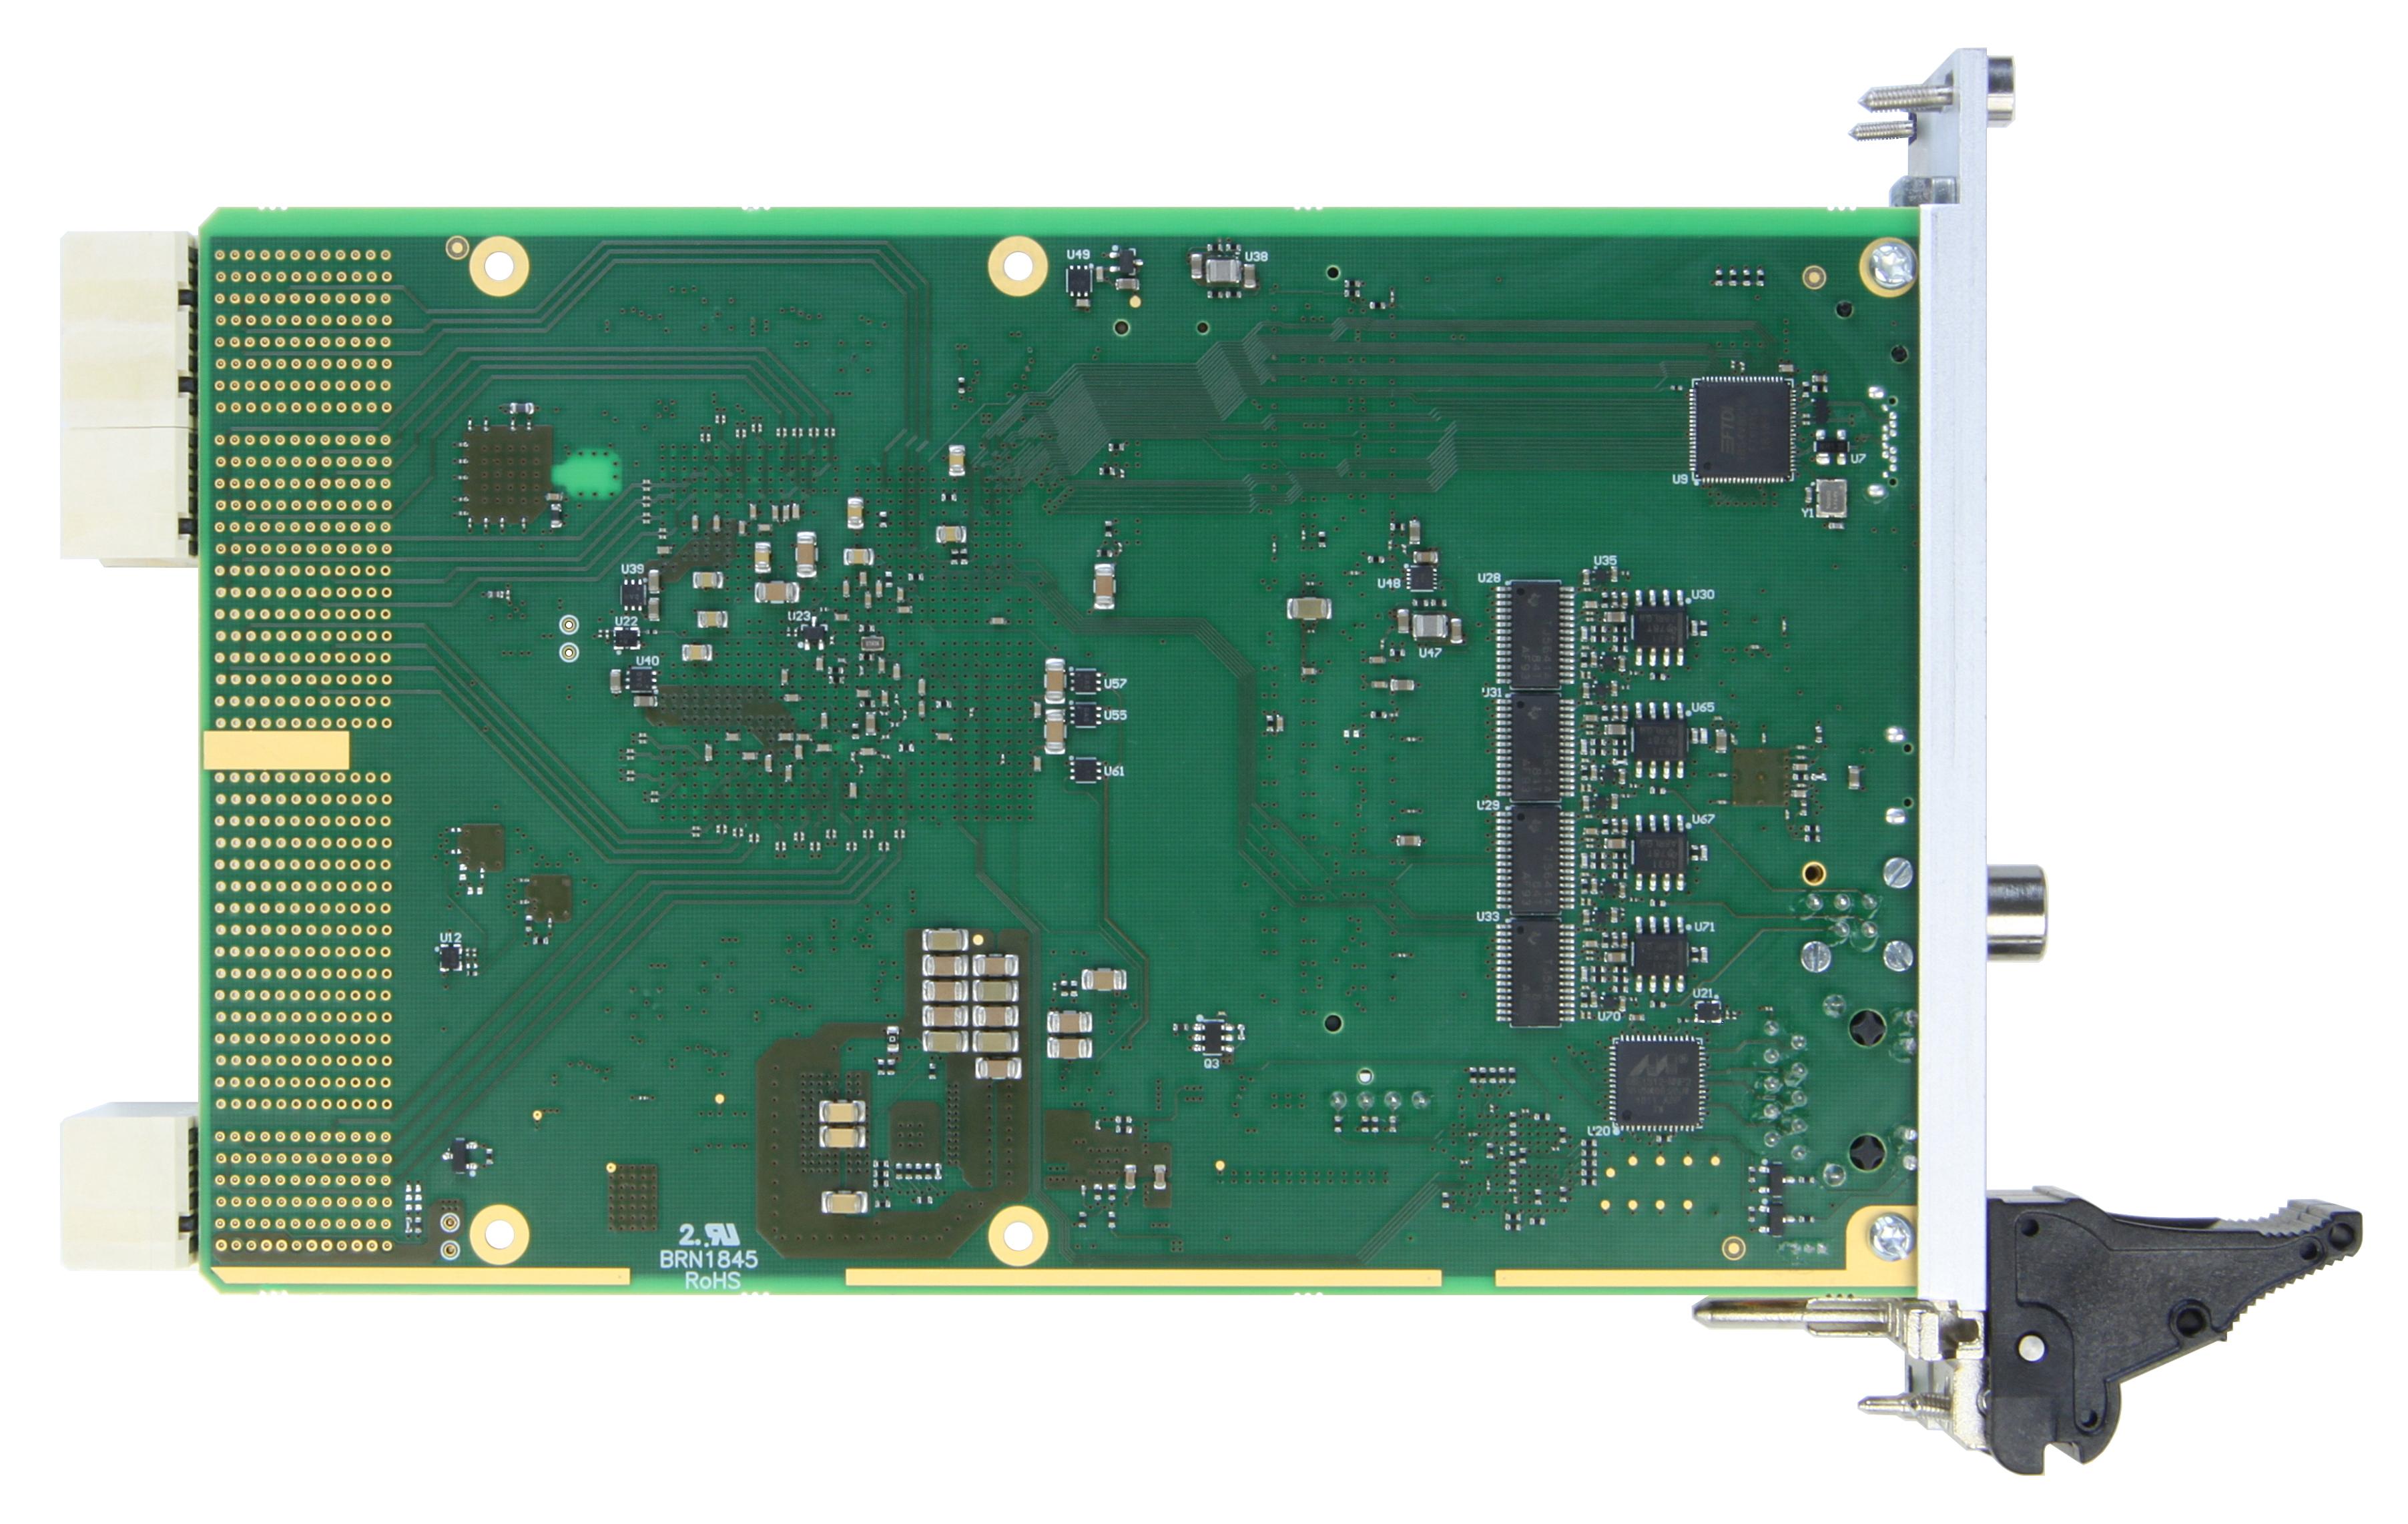 FPGA Module with Xilinx Artix-7 XC7A35T-2CSG324C, 2x50-pin header, 3 5 x  7 3 cm